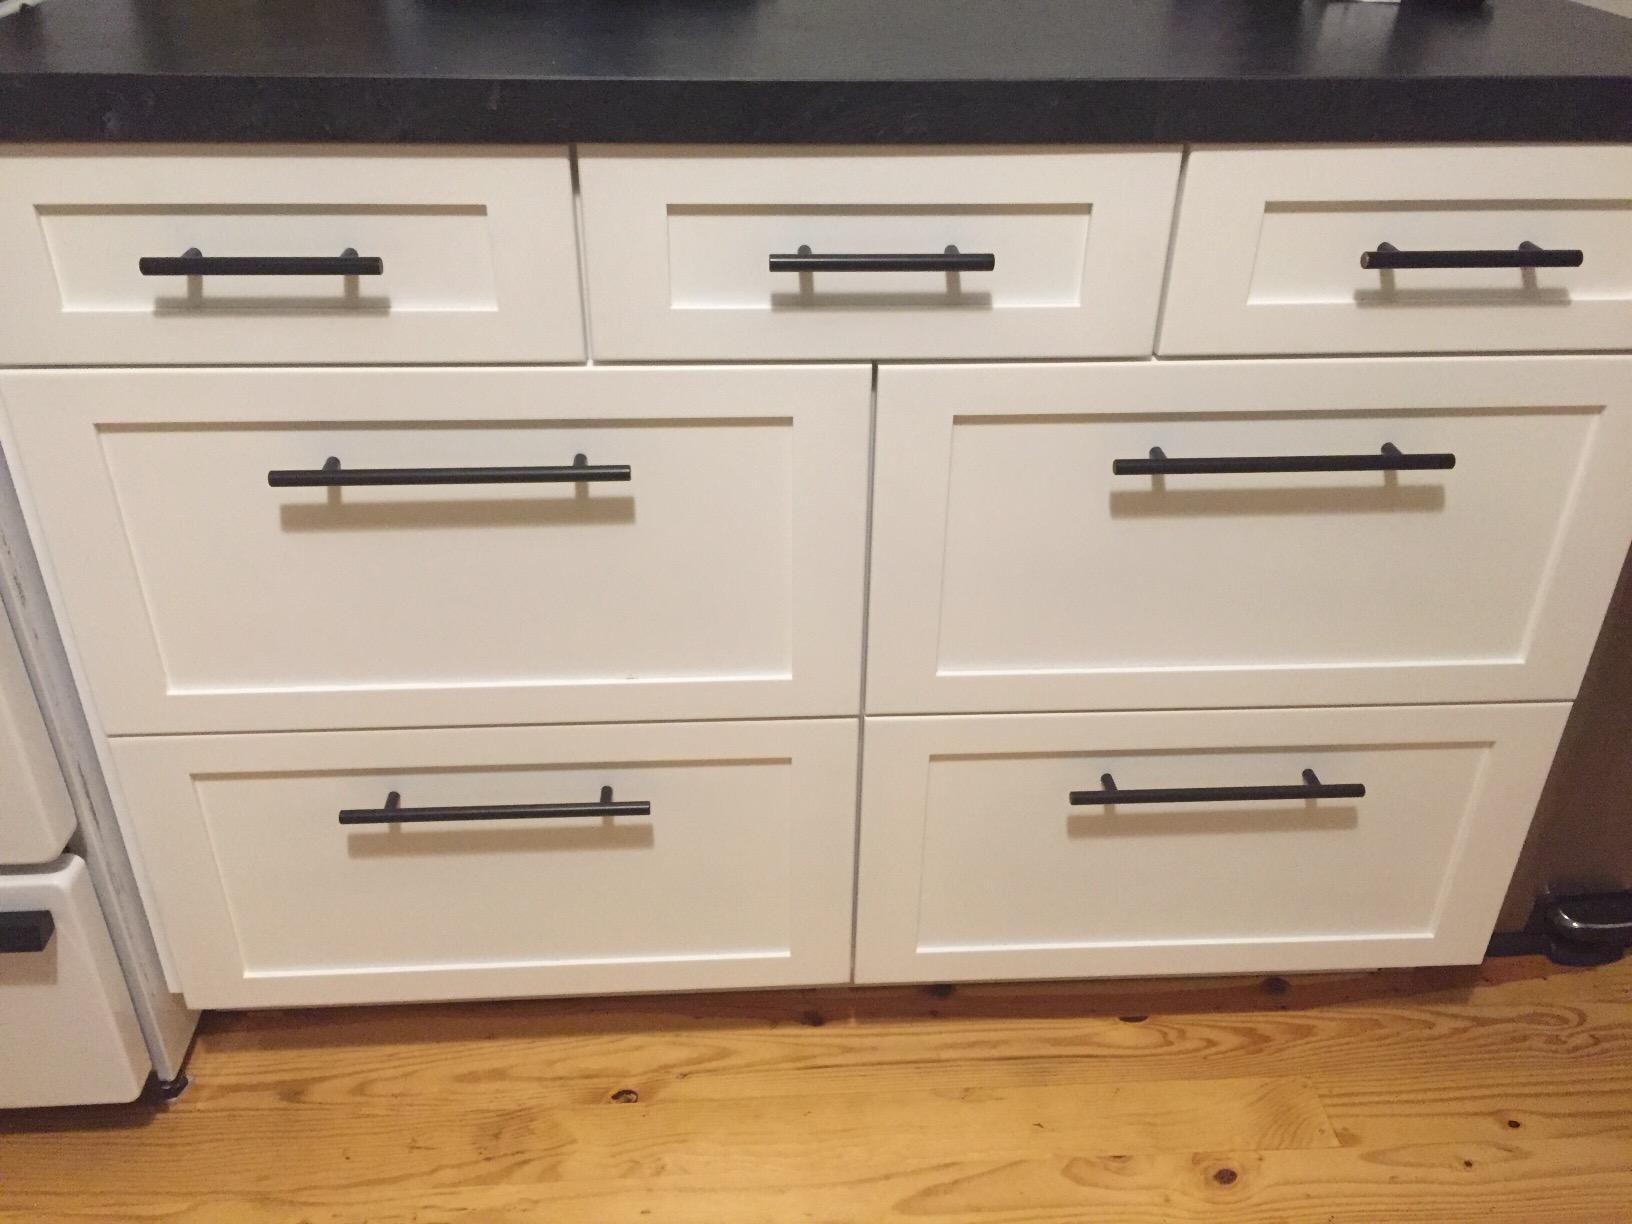 Oil Rubbed Bronze Matte Black Solid Kitchen Cabinet Bar Pull Handles 6 Amazon Com Kitchen Cabinets Bar Pulls Kitchen Kitchen Cabinet Handles